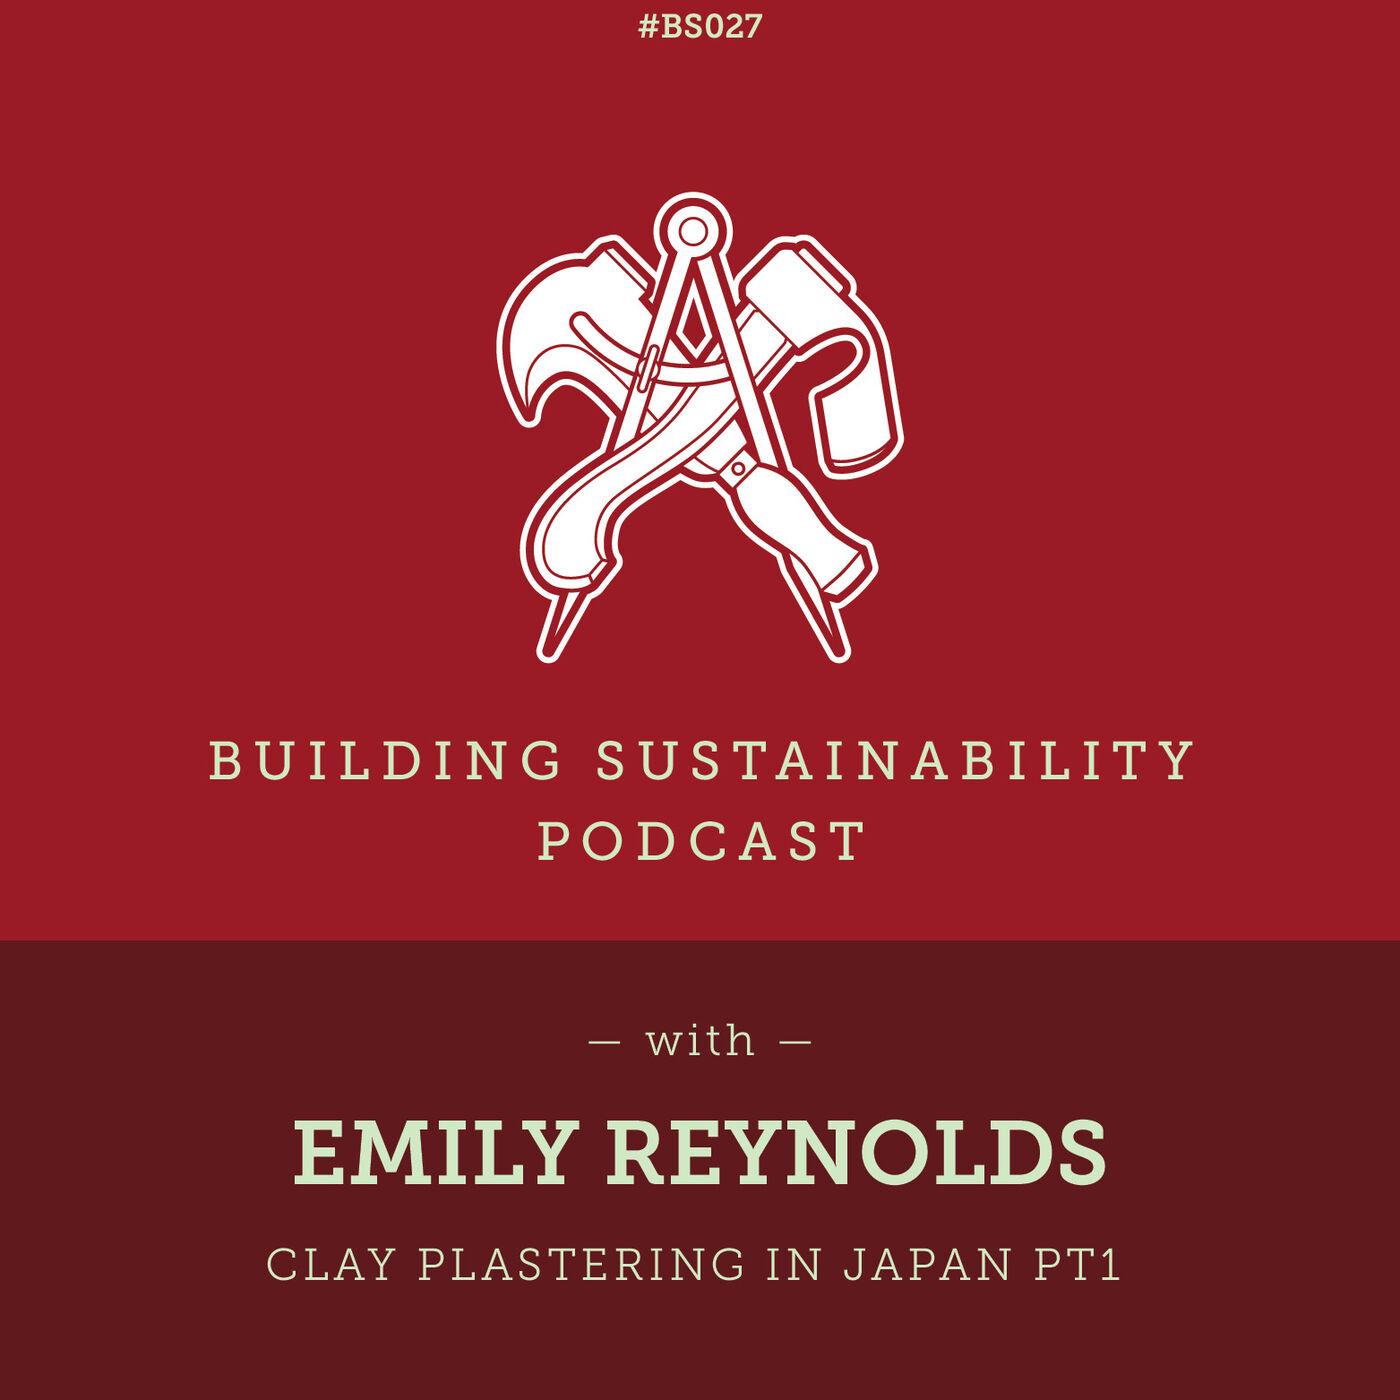 Clay plastering in Japan Pt1 - Emily Reynolds - BS027